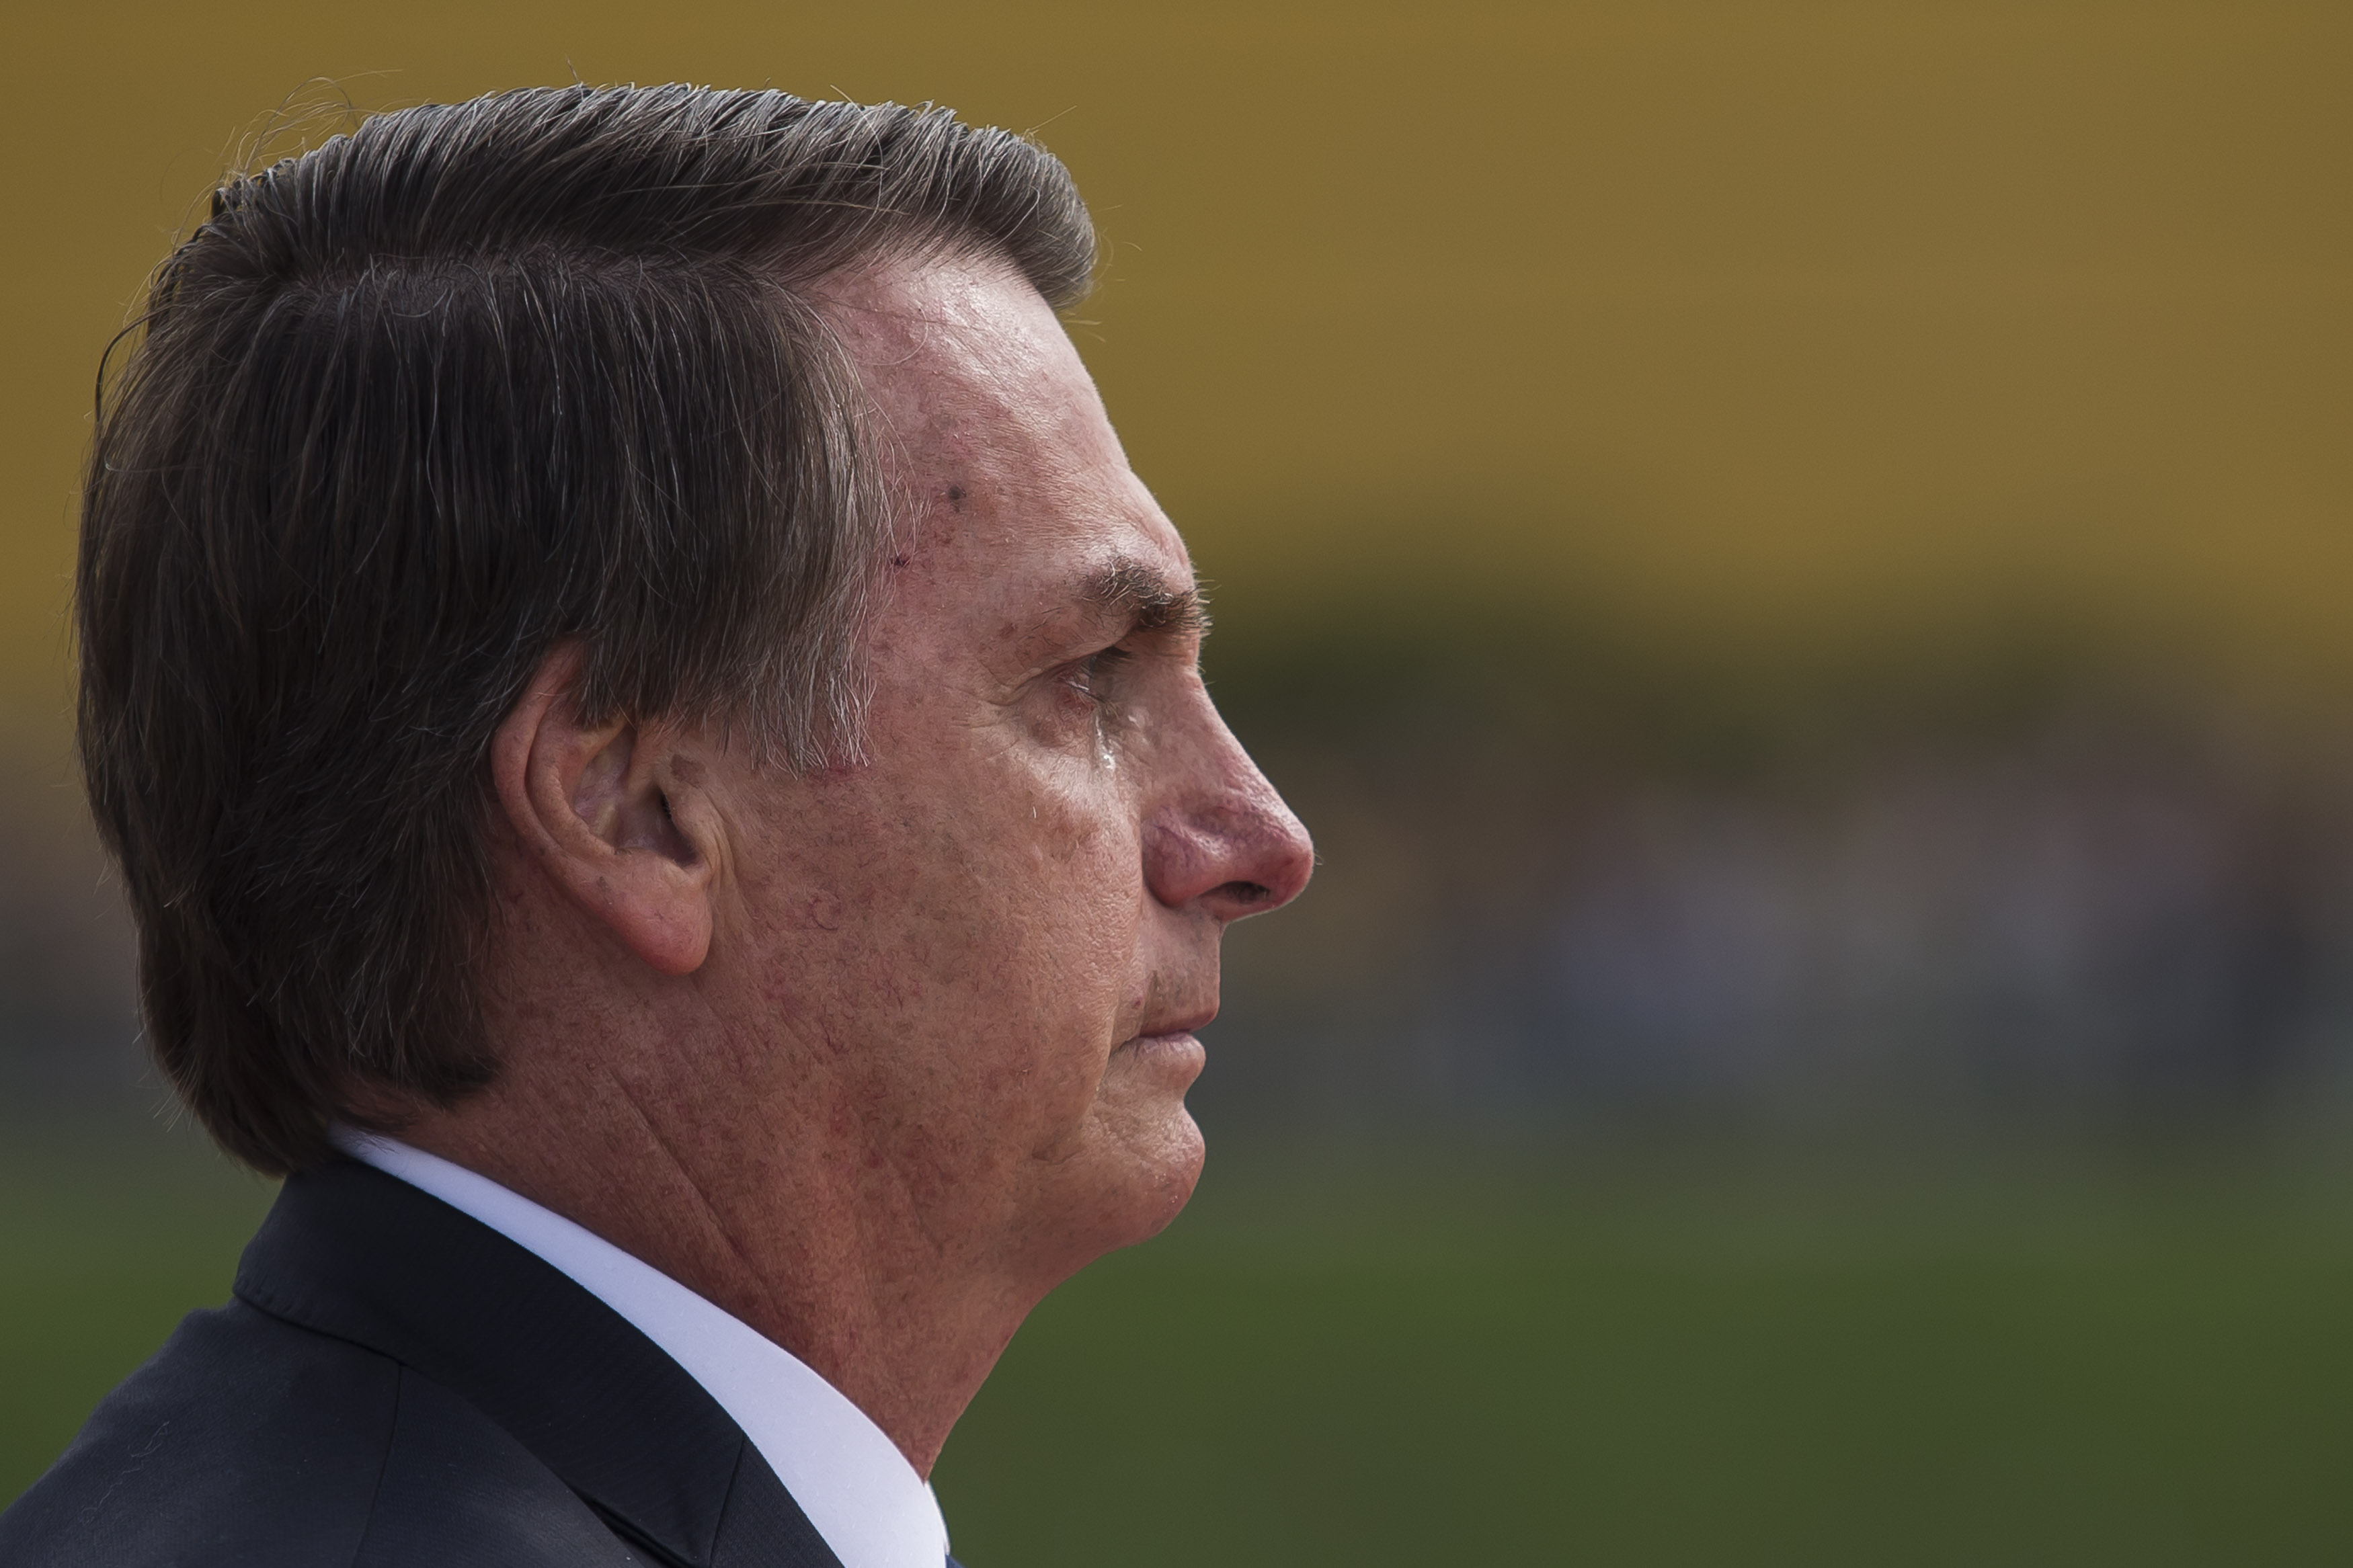 2019 Jair Bolsonaro Presidential Inauguration